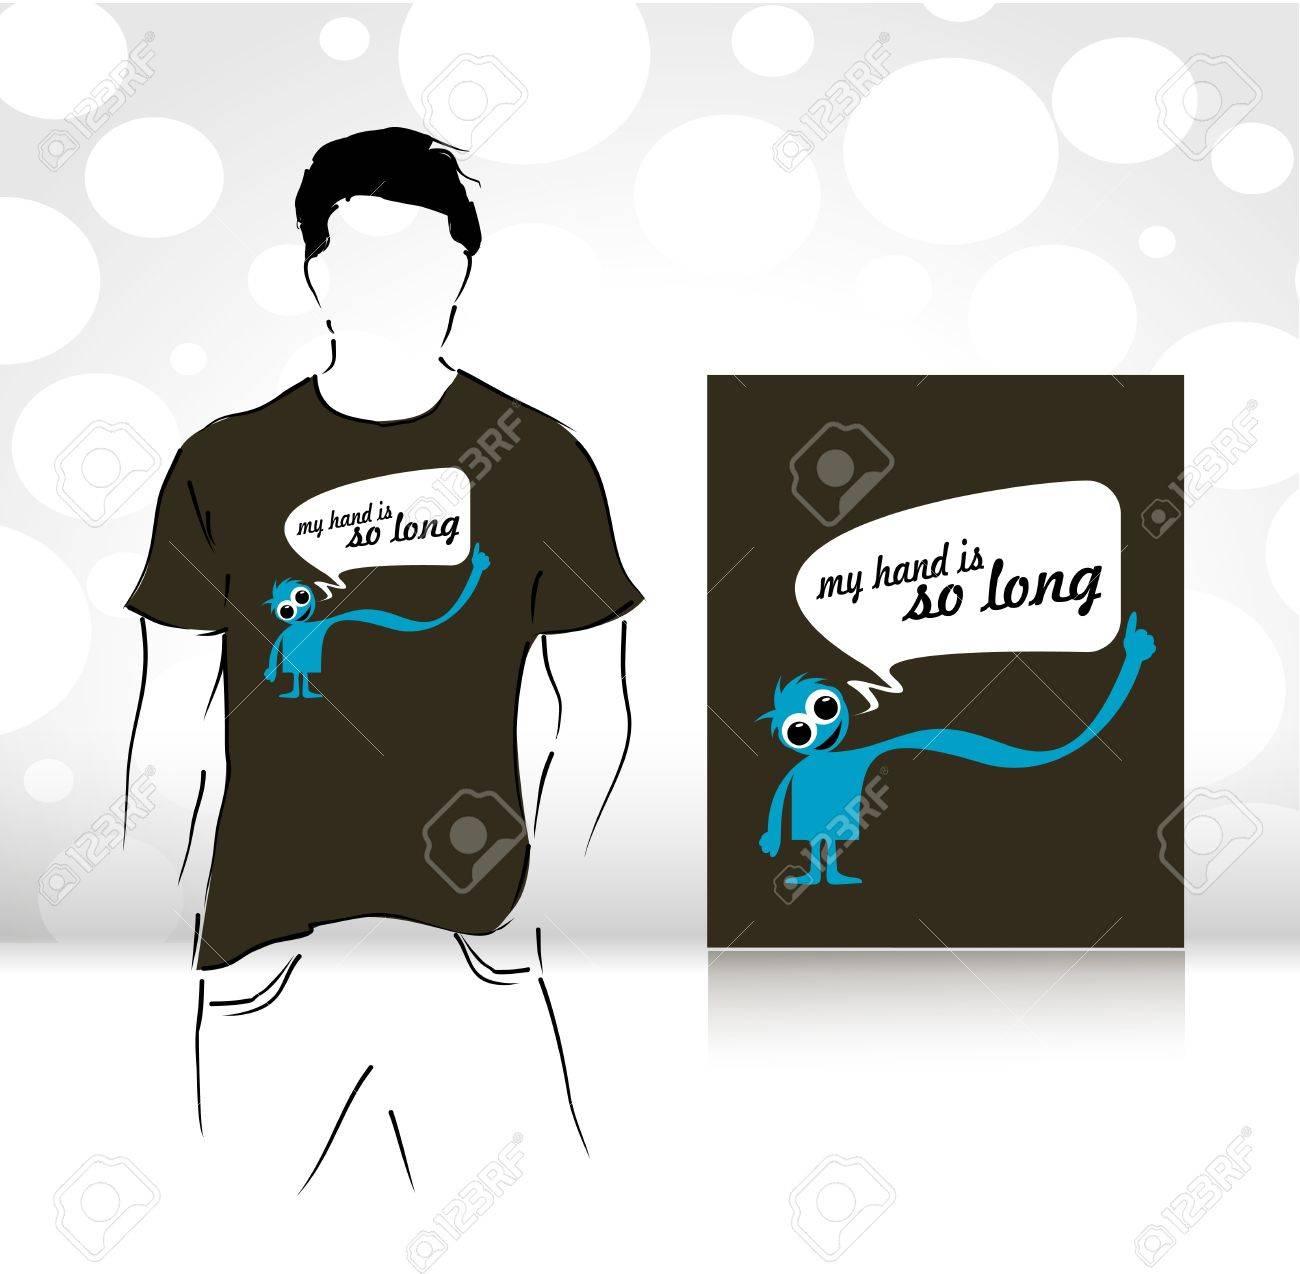 Shirt design illustrator template - T Shirt Design Template Editable Vector Illustration Stock Vector 10510302